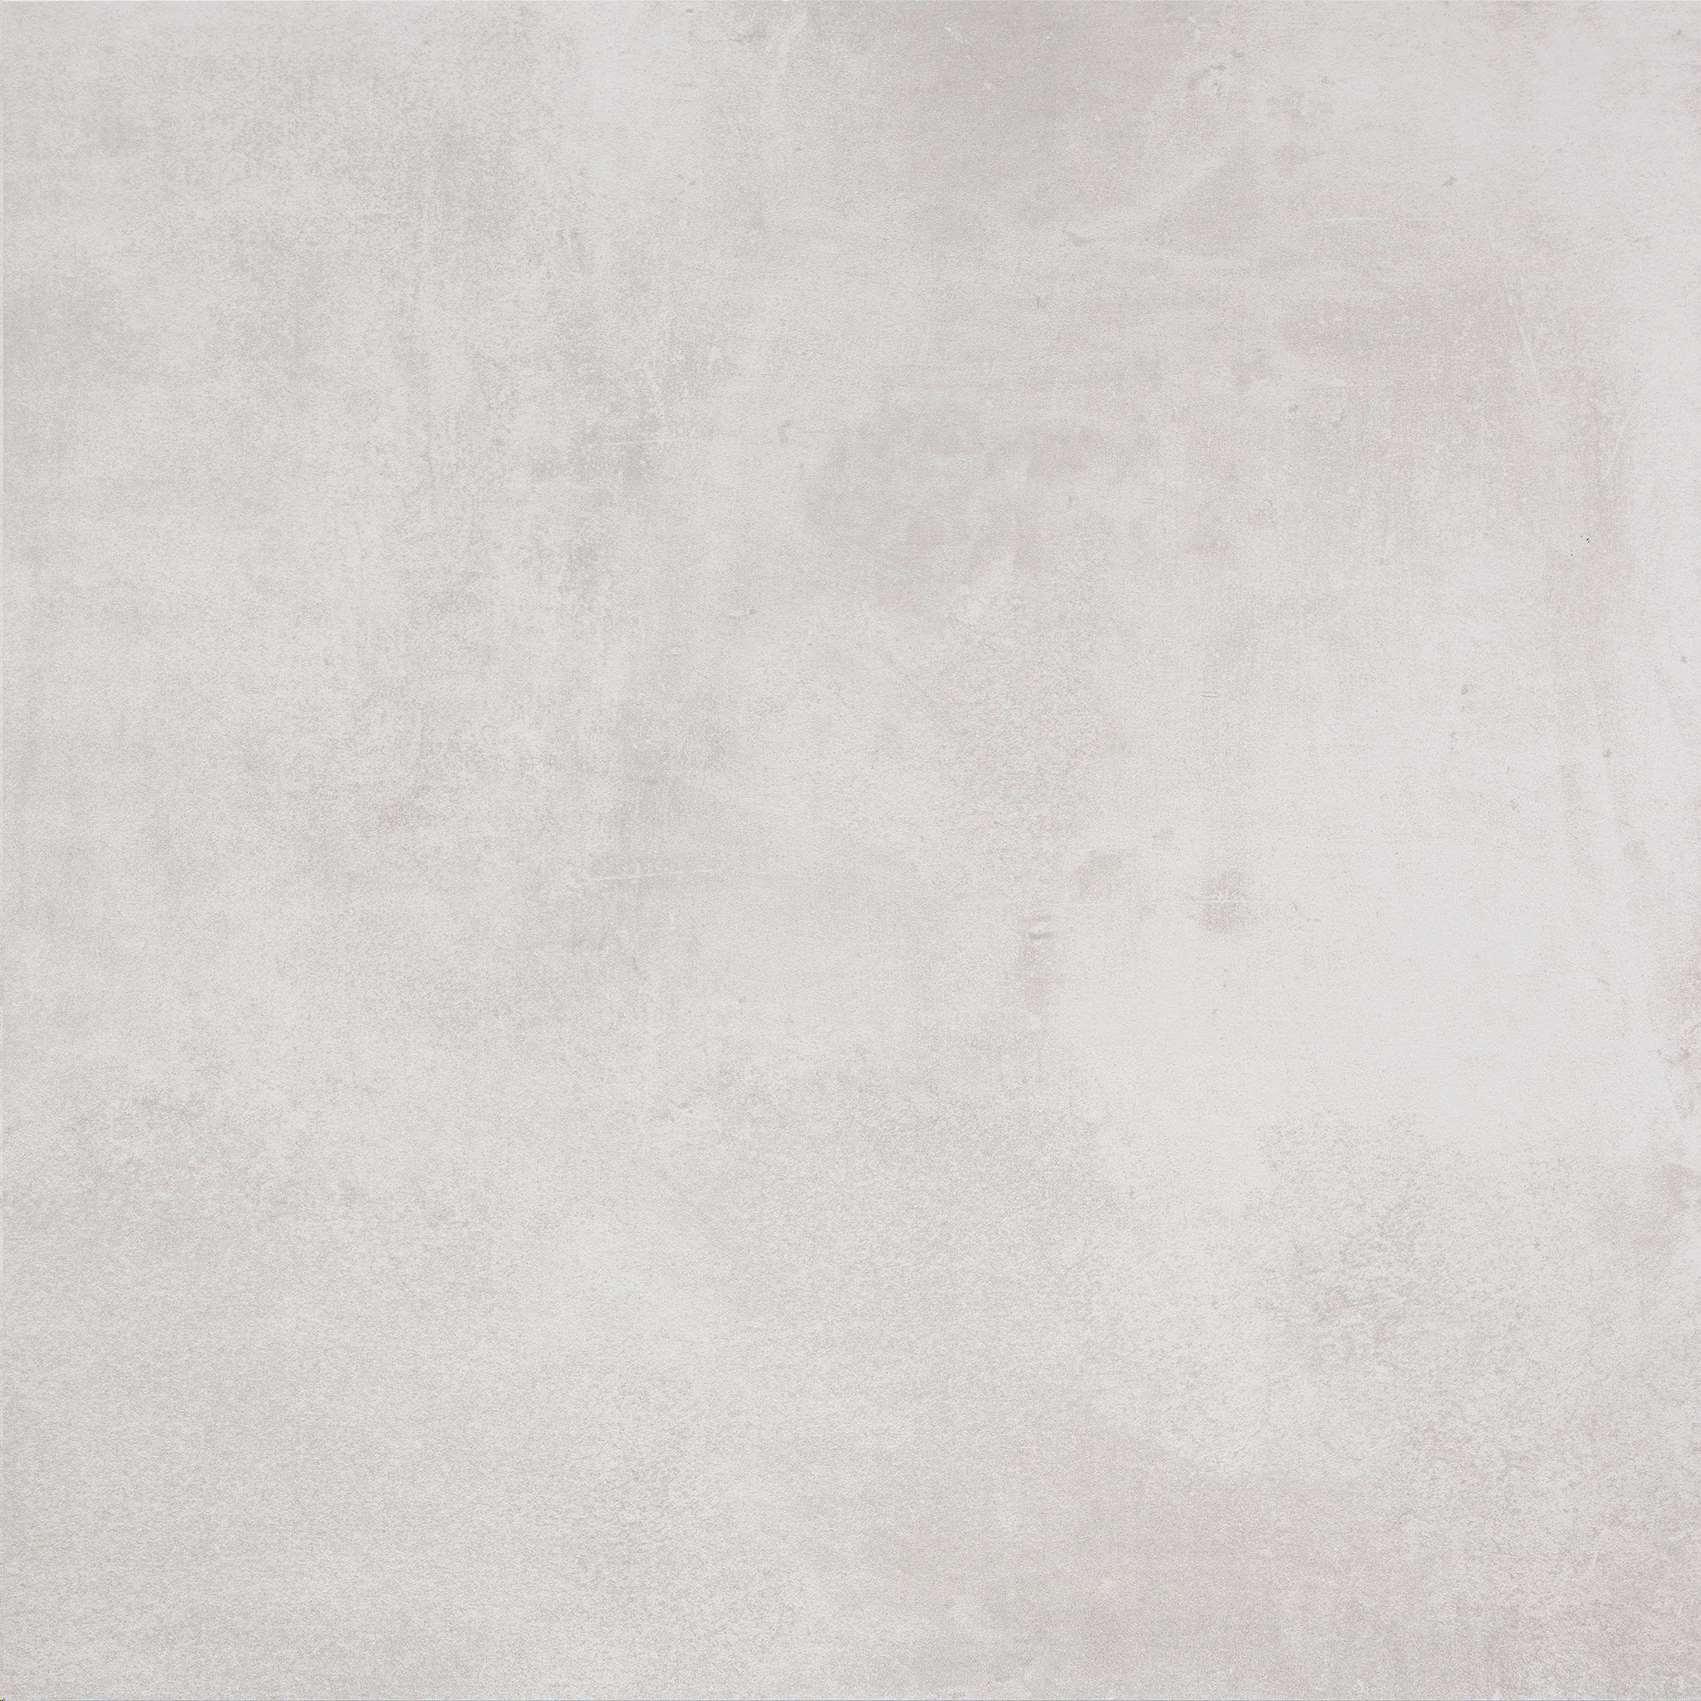 carrelage crz64 nice bianco grip rett blanc 60 x 60 vente. Black Bedroom Furniture Sets. Home Design Ideas